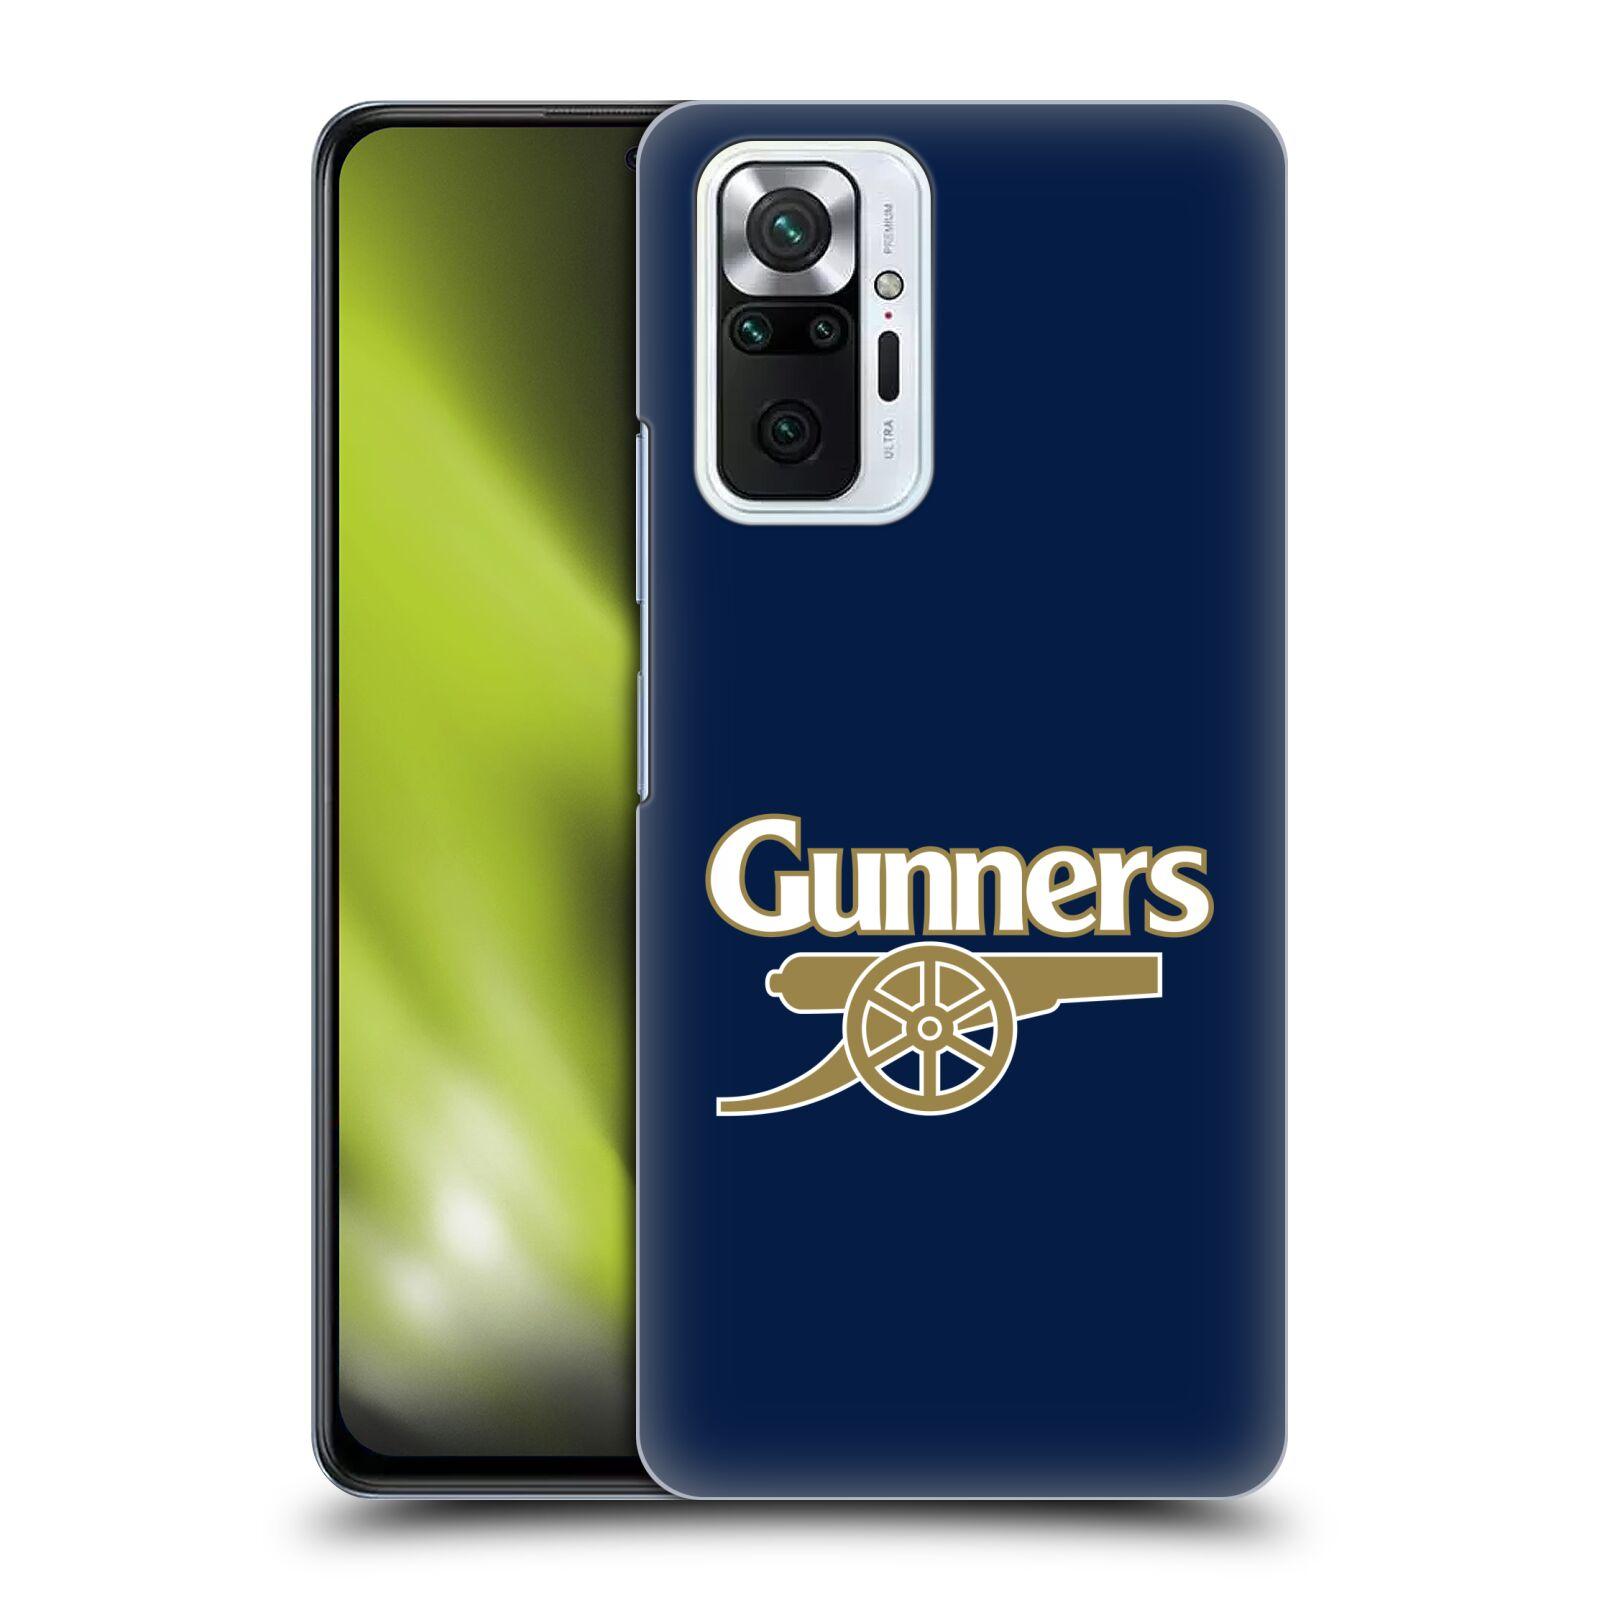 Plastové pouzdro na mobil Xiaomi Redmi Note 10 Pro - Head Case - Arsenal FC - Gunners